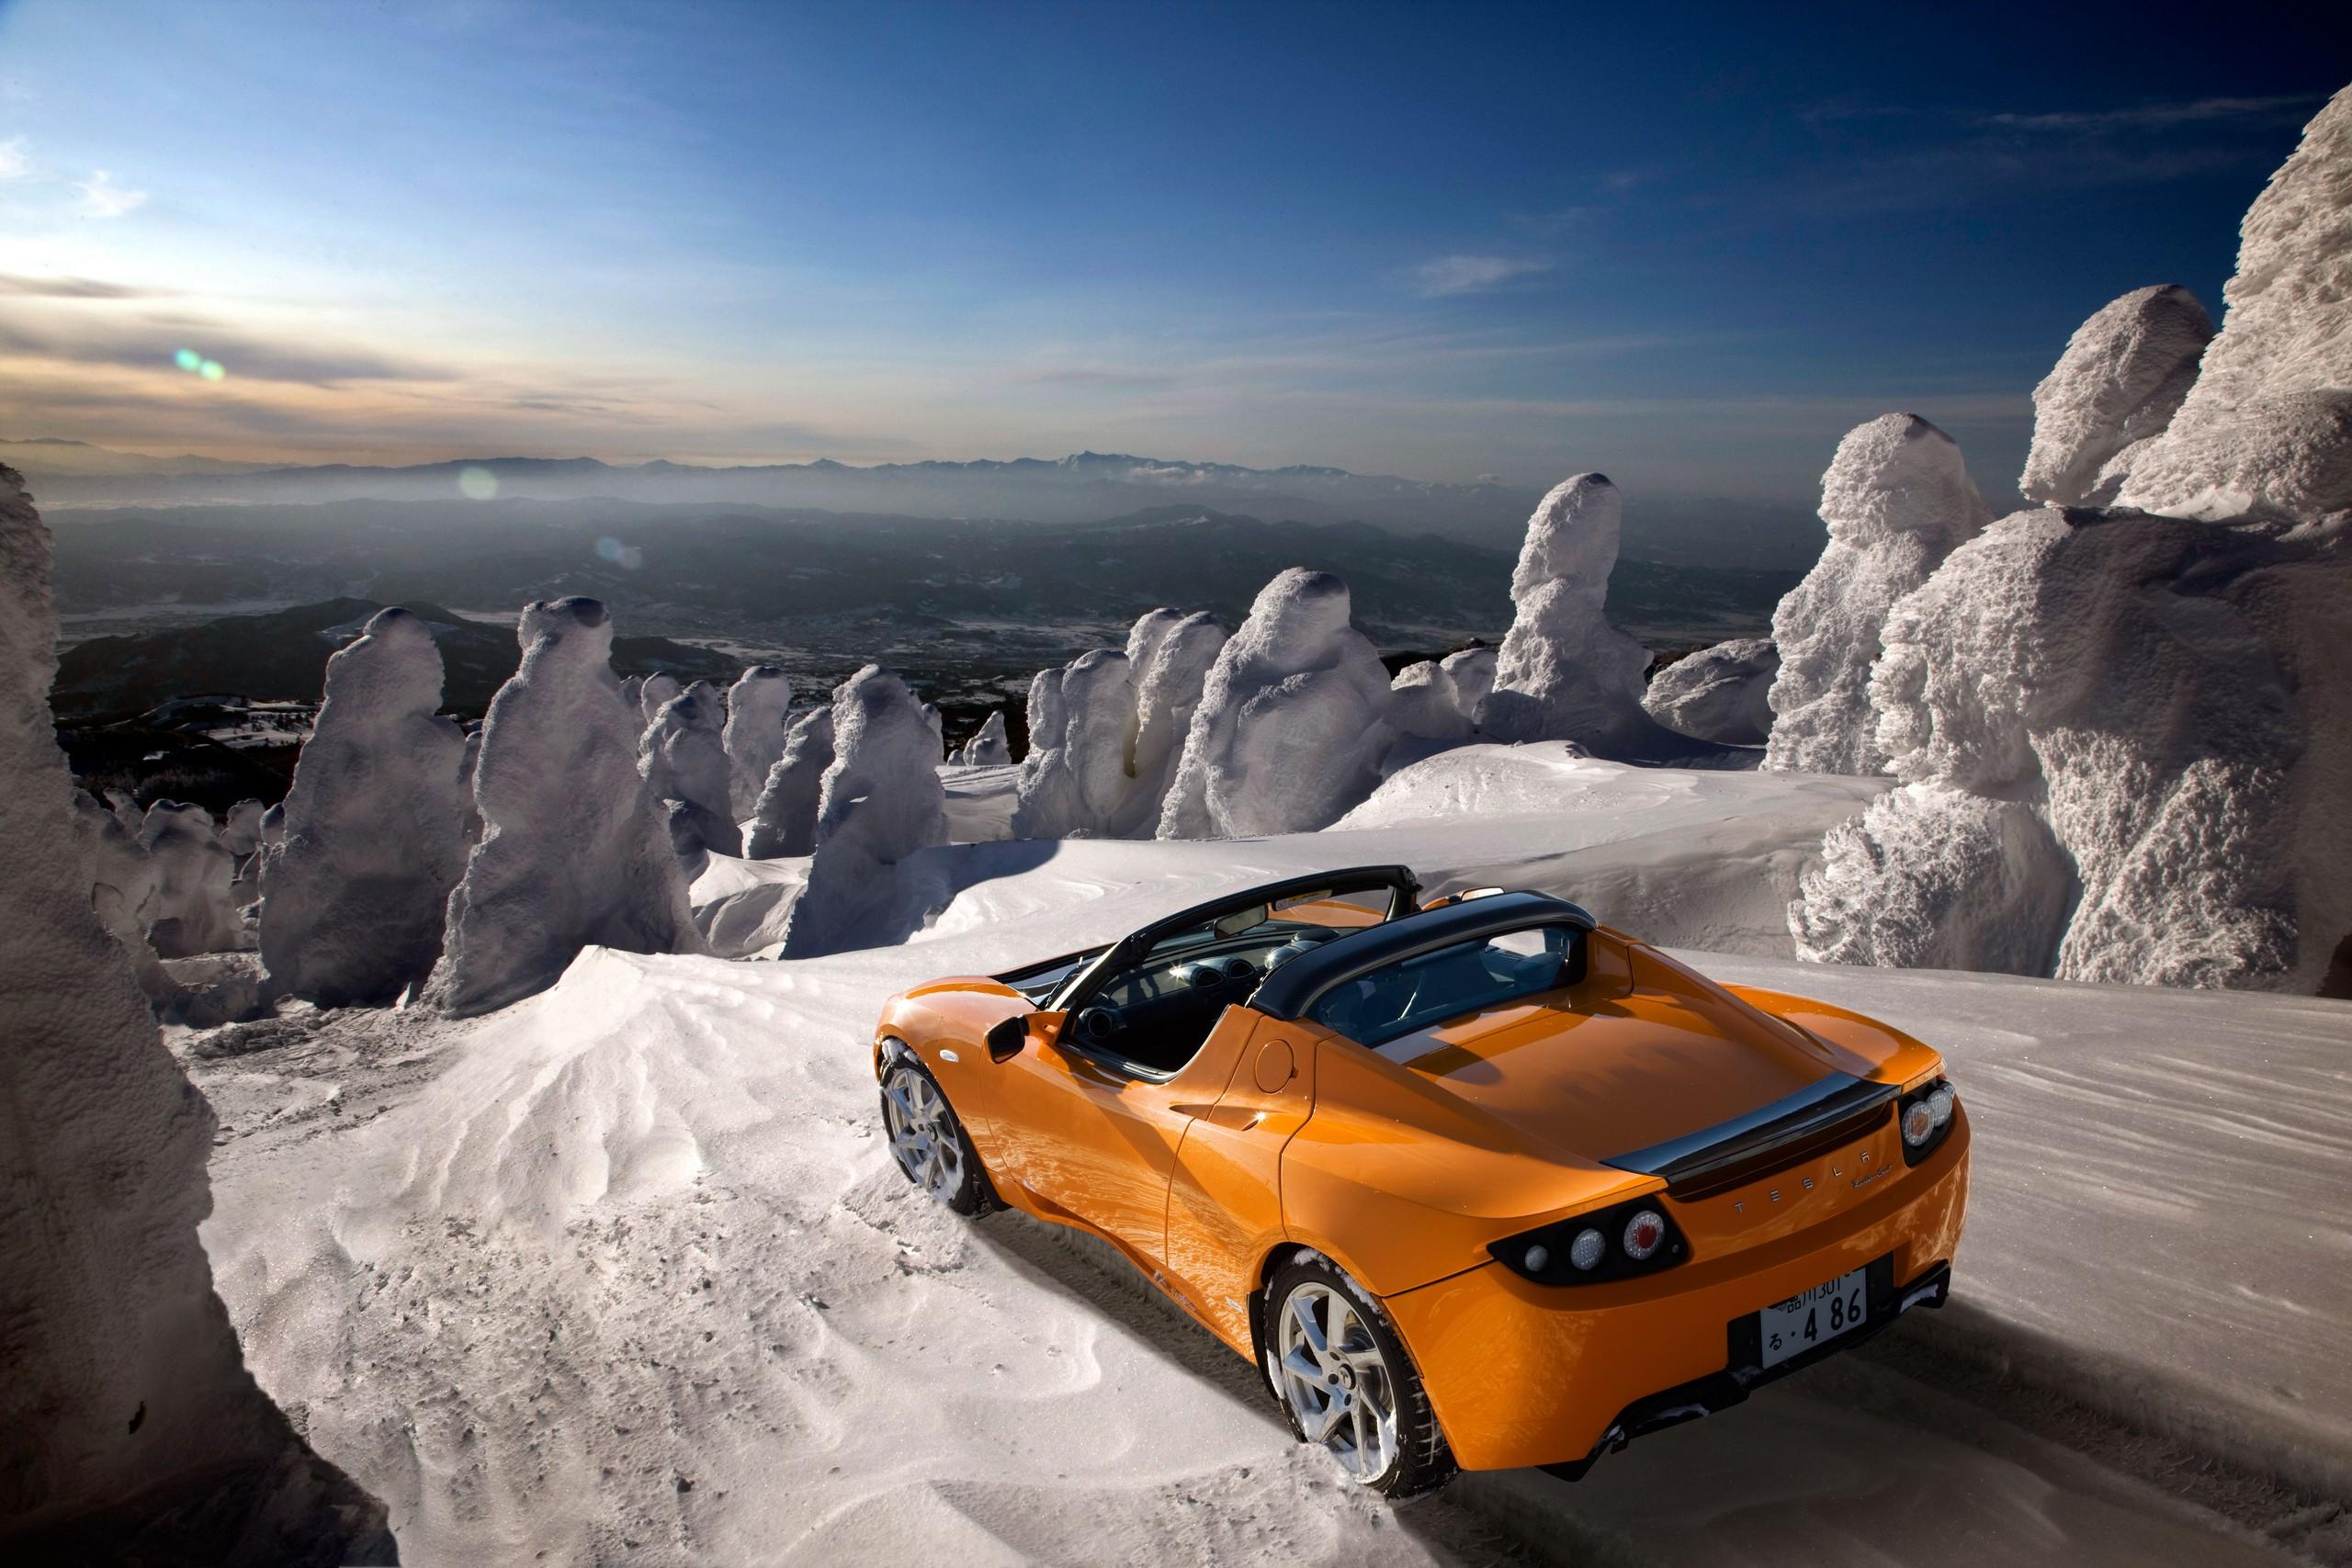 Tesla Roadster Orange Wallpaper 2560x1707 ID33892 2560x1707